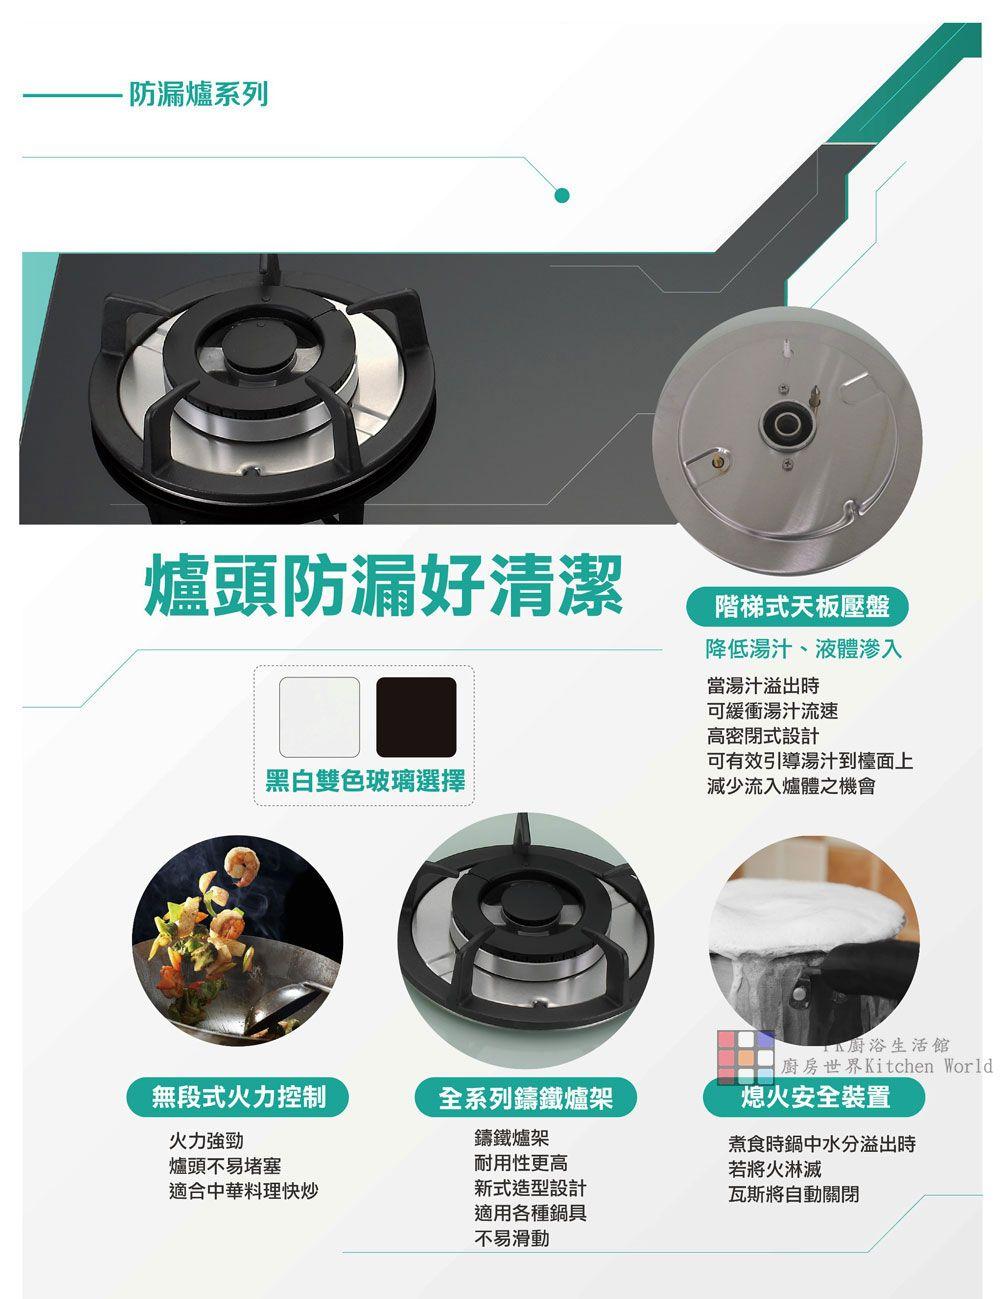 PK/goods/Rinnai/Gas stove/RB-100GH-DM-1.jpg